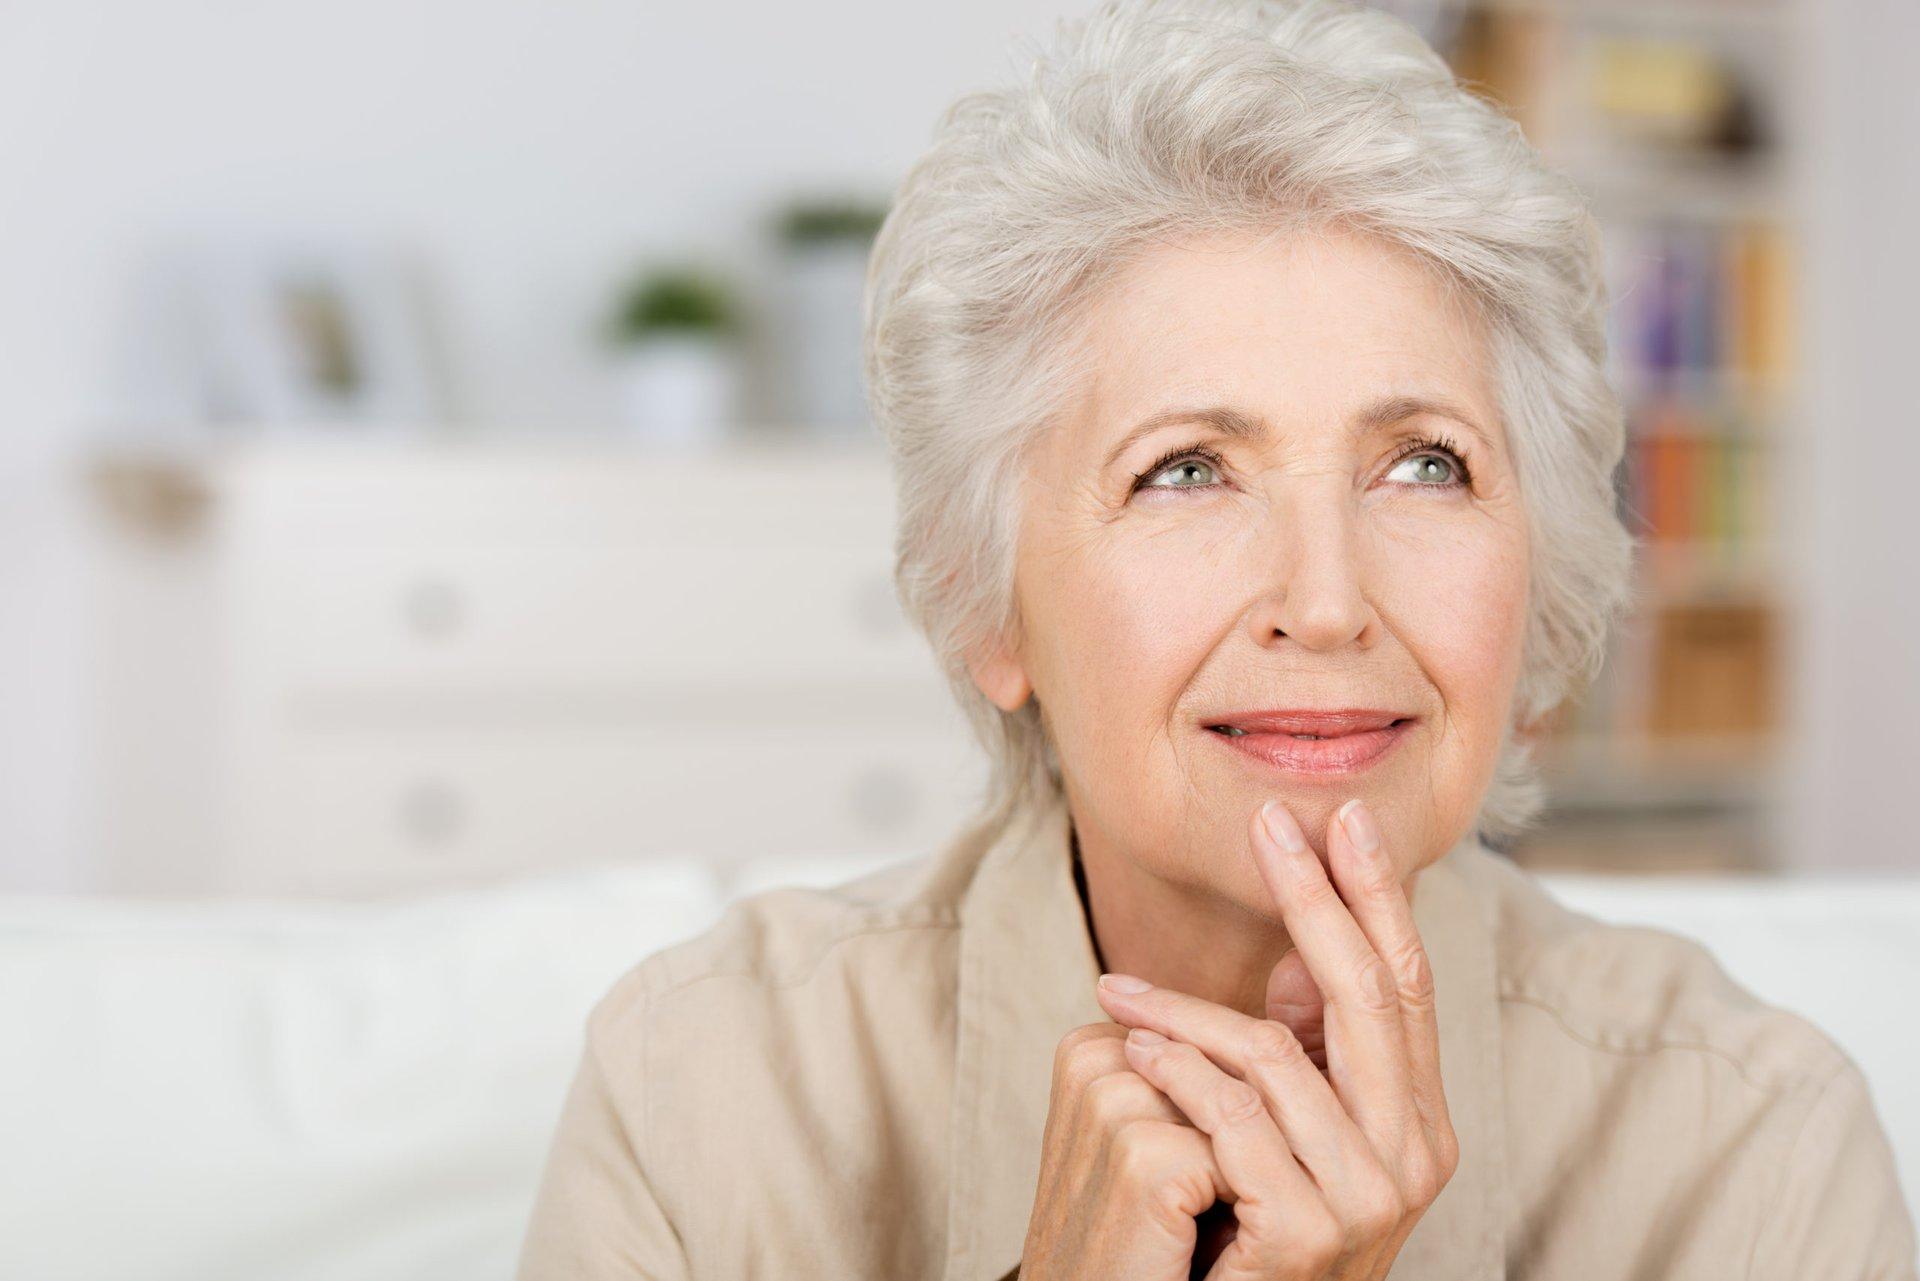 Thinking senior woman